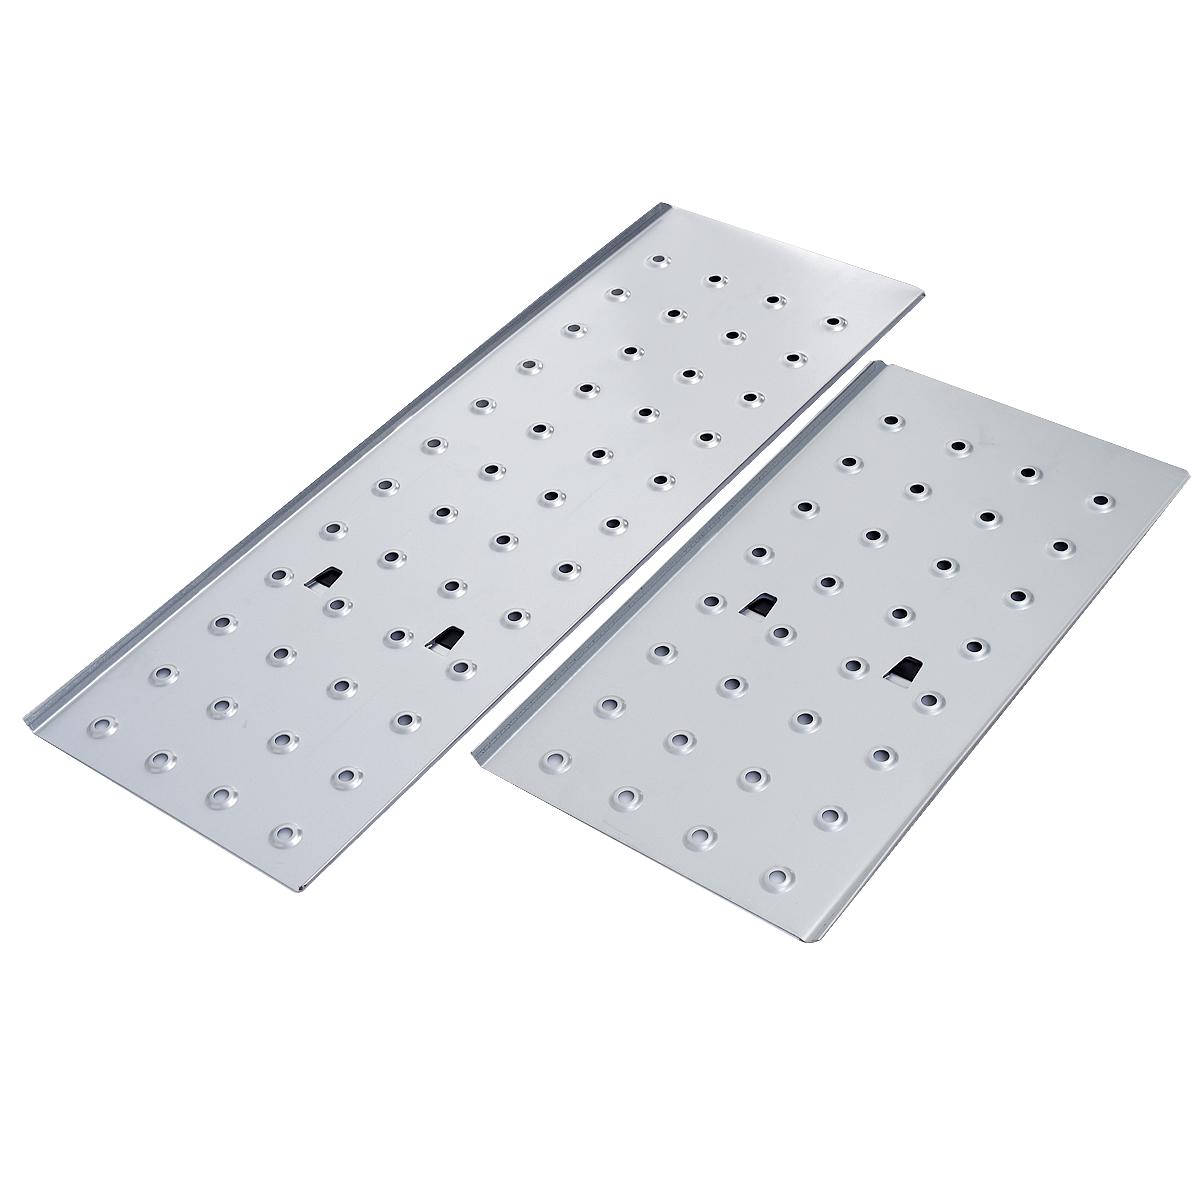 Aluminum Scaffold Stairs : New lb ft step platform multi purpose aluminum